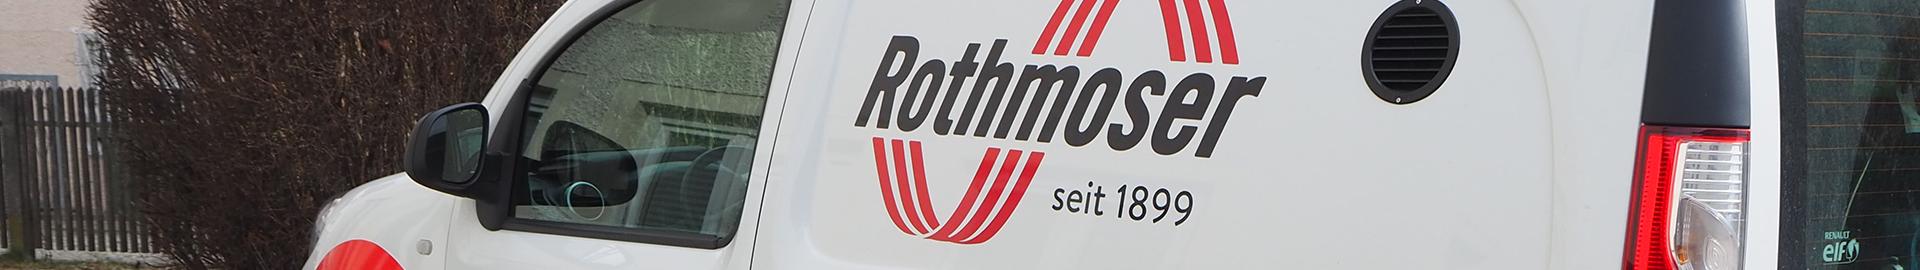 Rothmoser E-Kangoo Elektromobilitäts Flotte